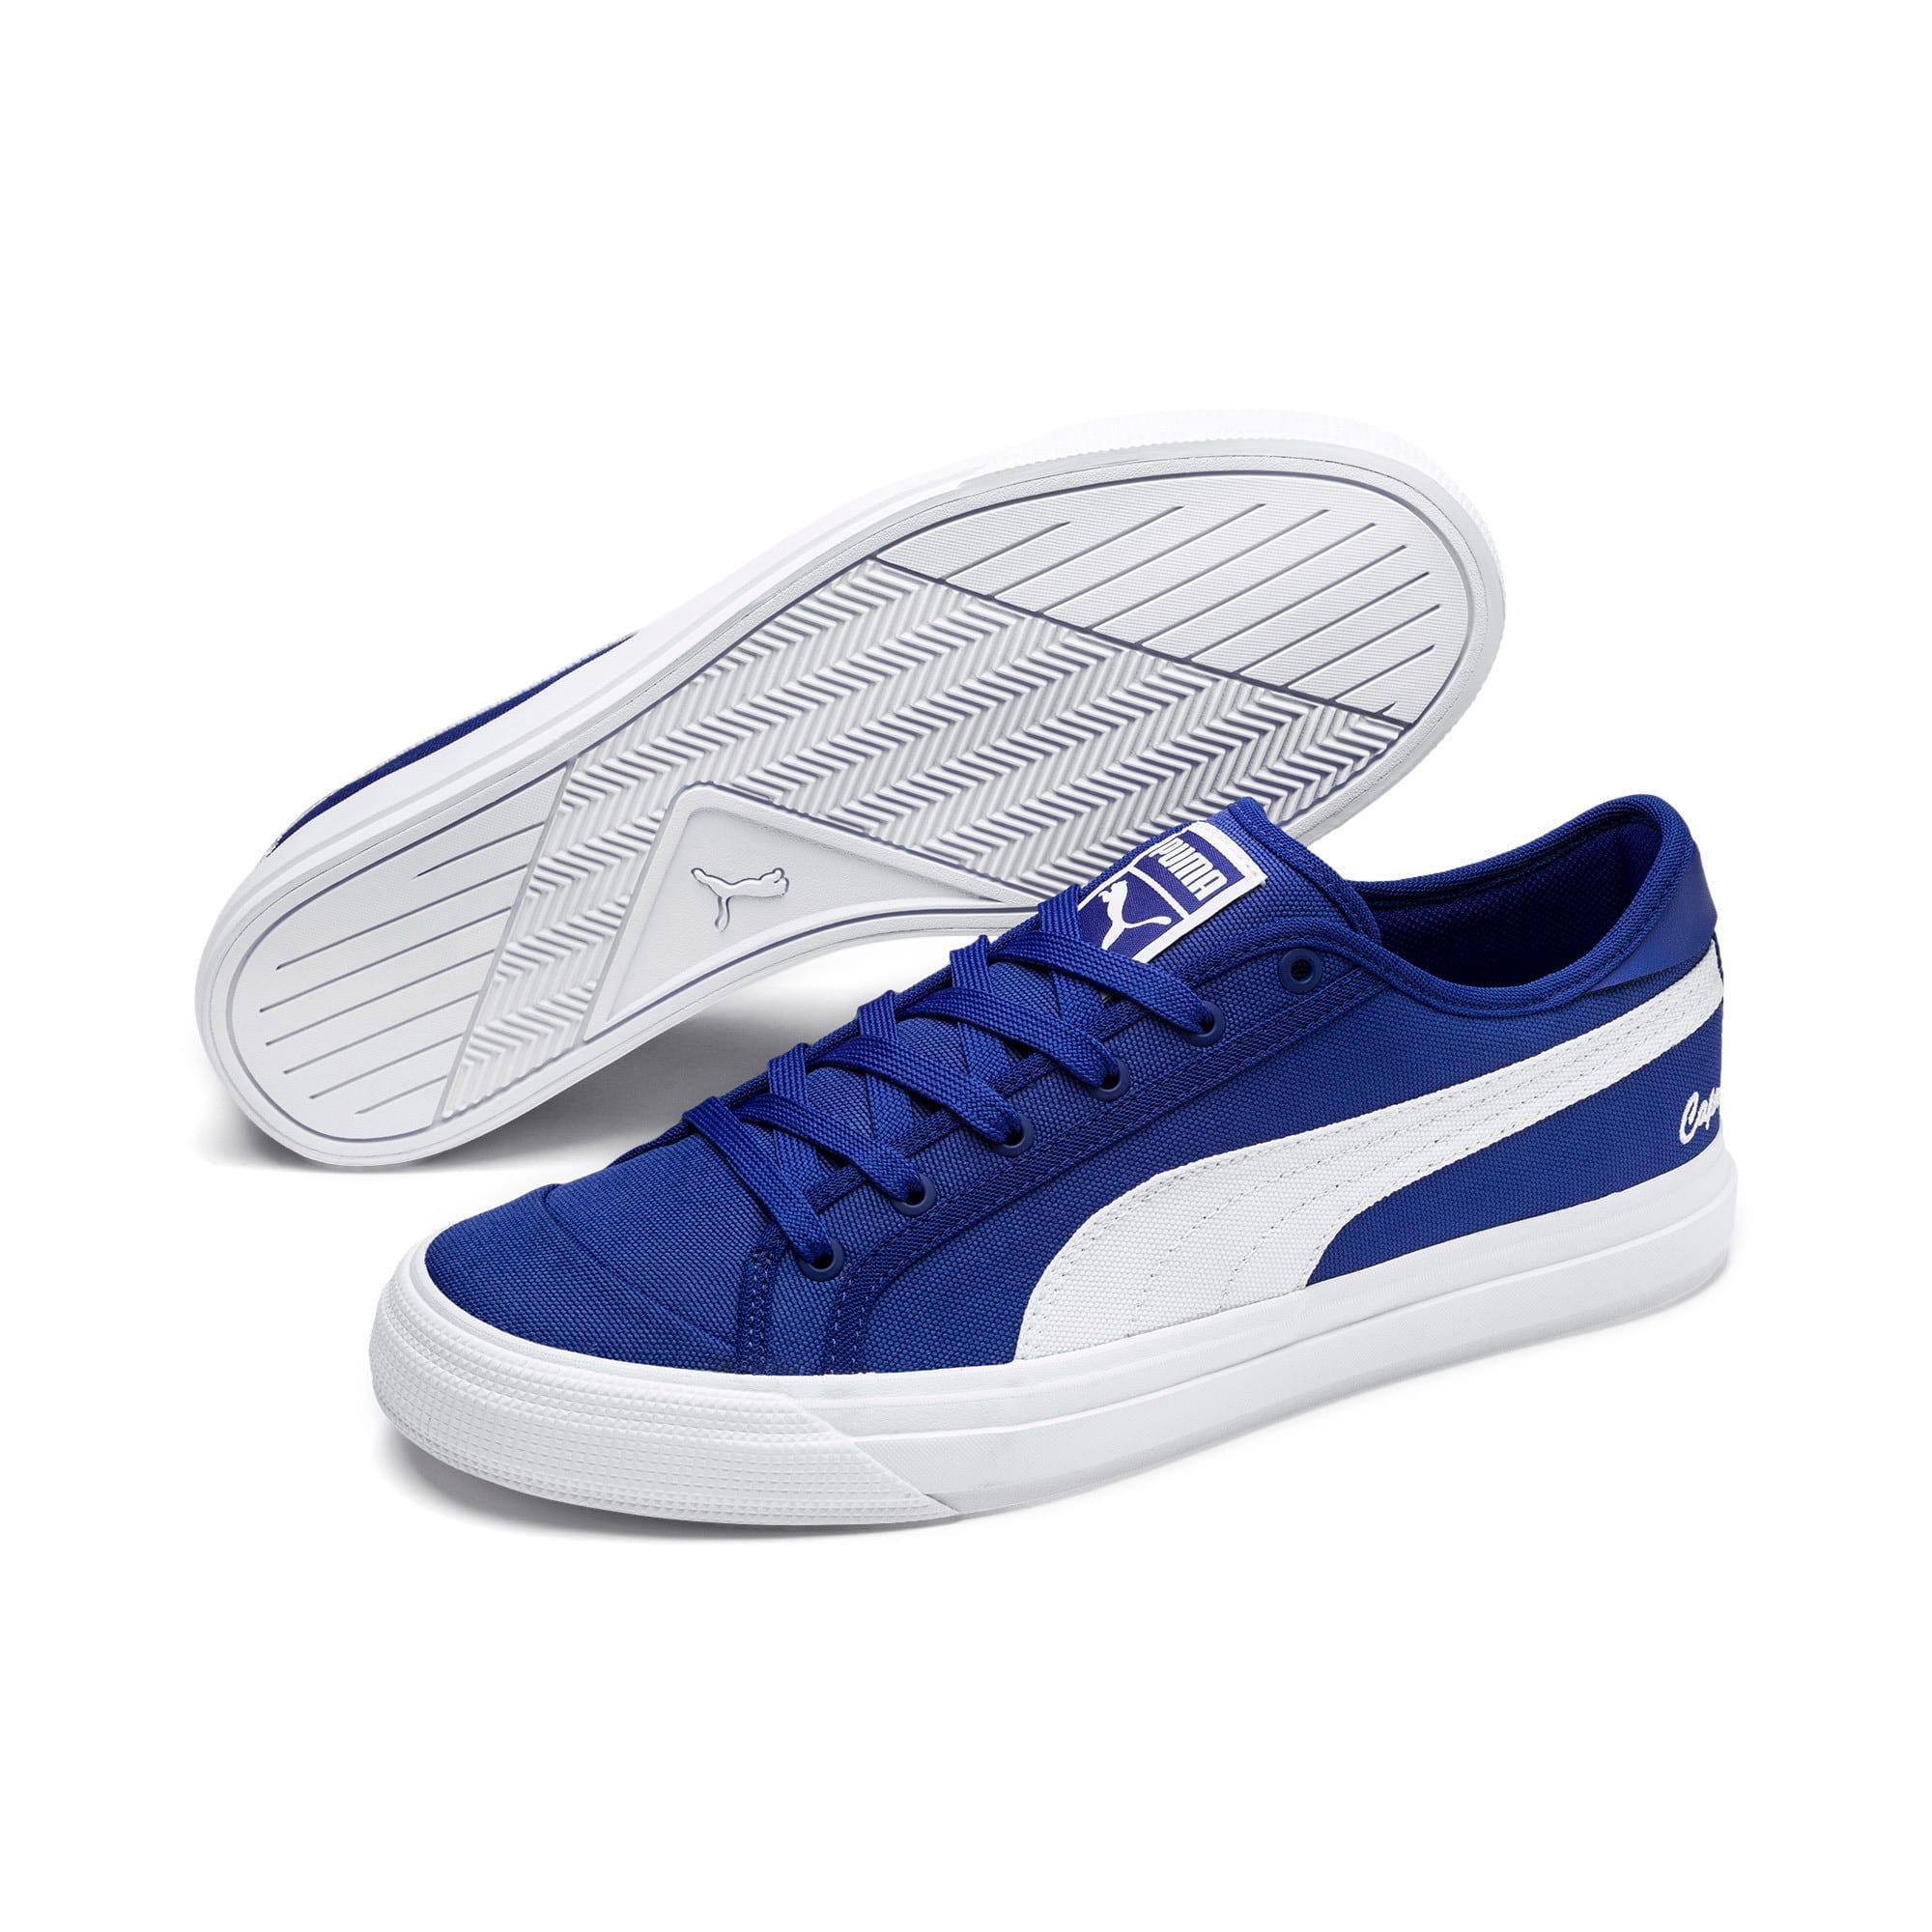 Thumbnail 2 of Capri Tennis Shoes, Surf DWeb-Puma Wht-Puma Wht, medium-IND